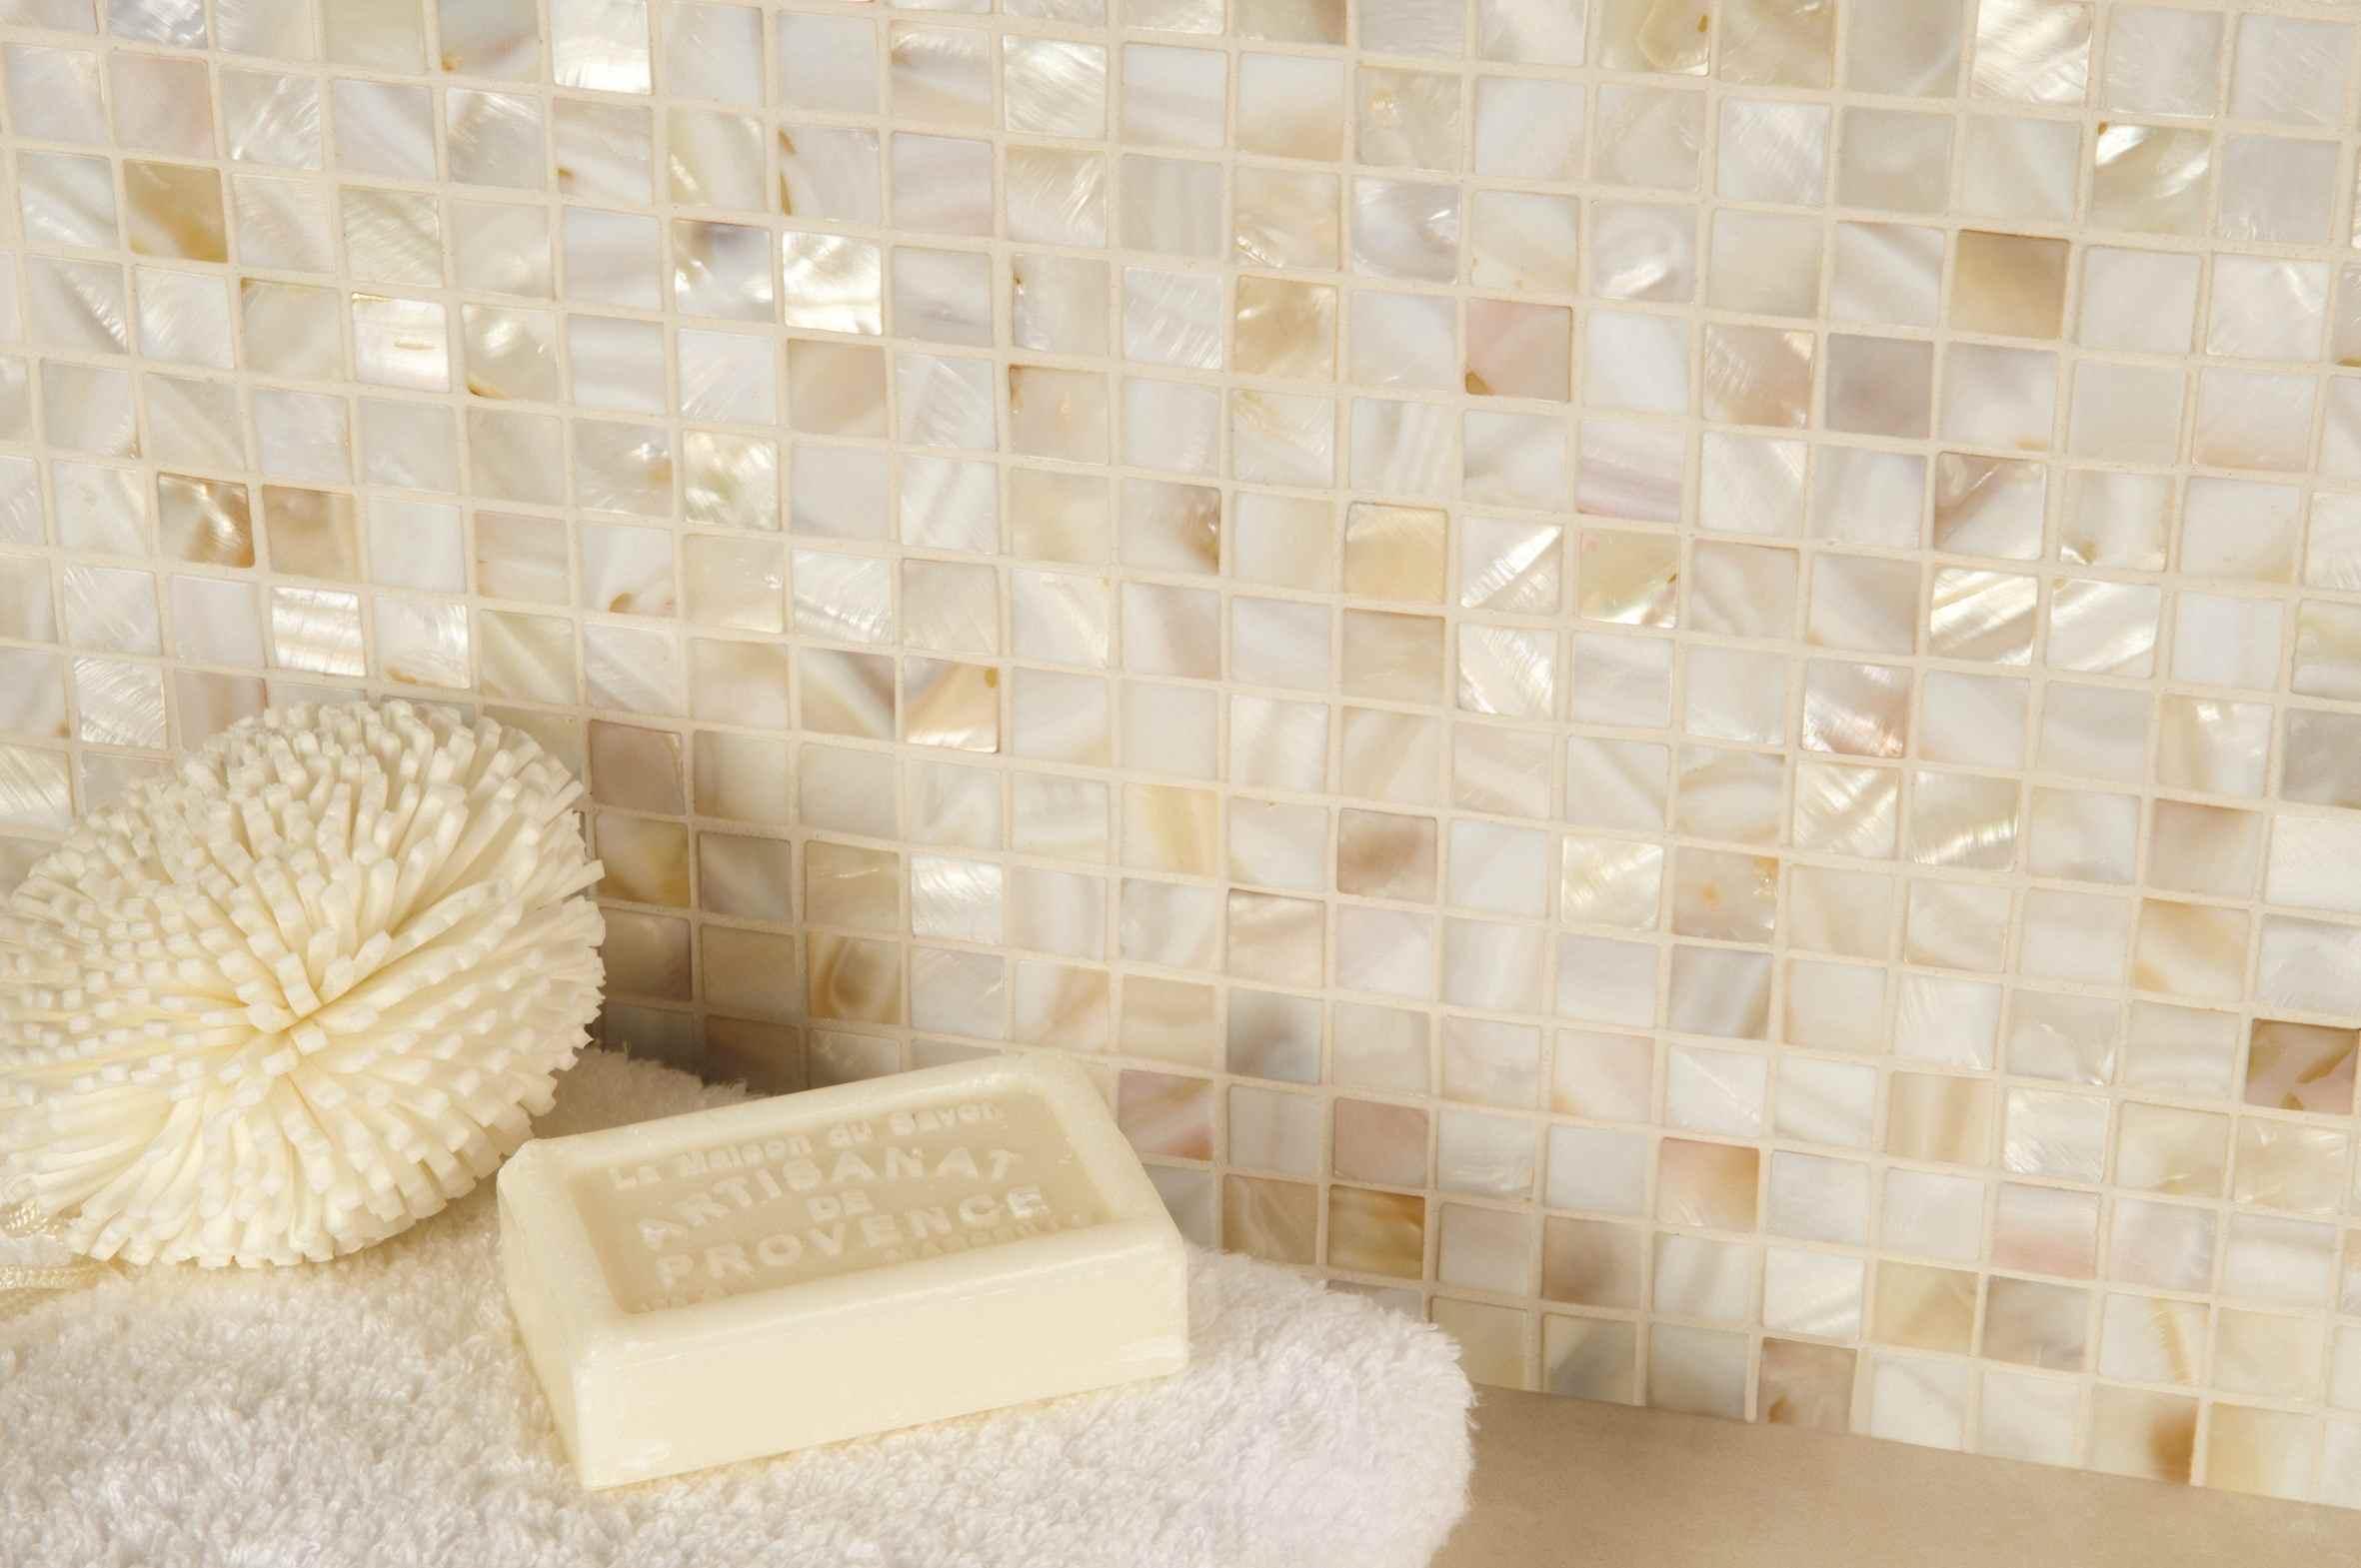 Original Style_Mosaics_Purity 300x300x2mm Natural Shell.jpg